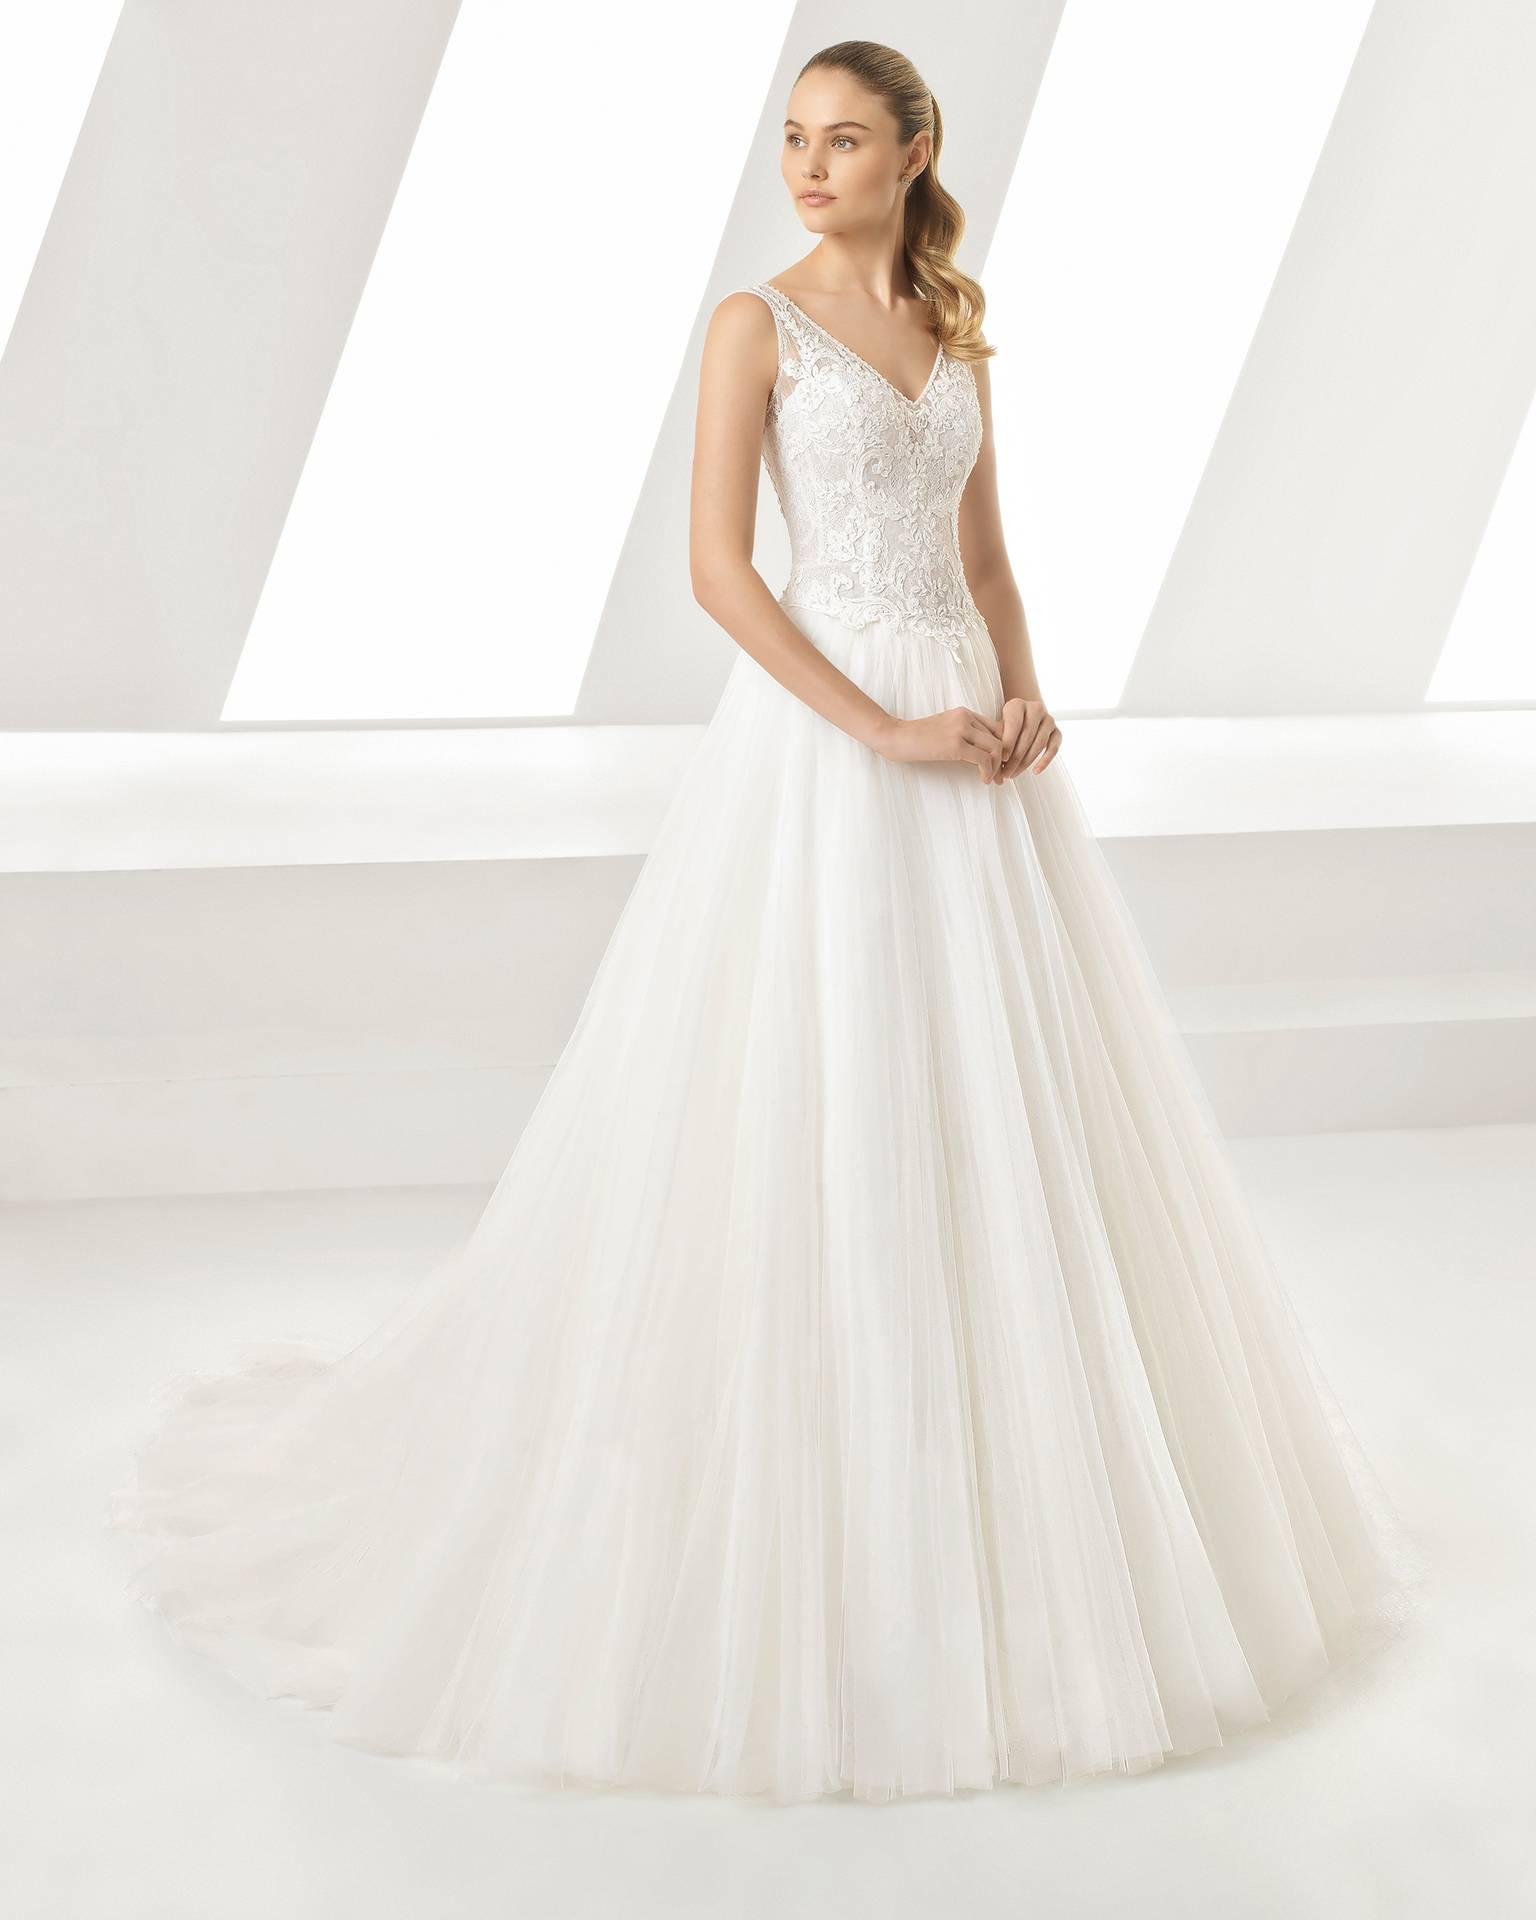 Robe de mariage marseille 13001